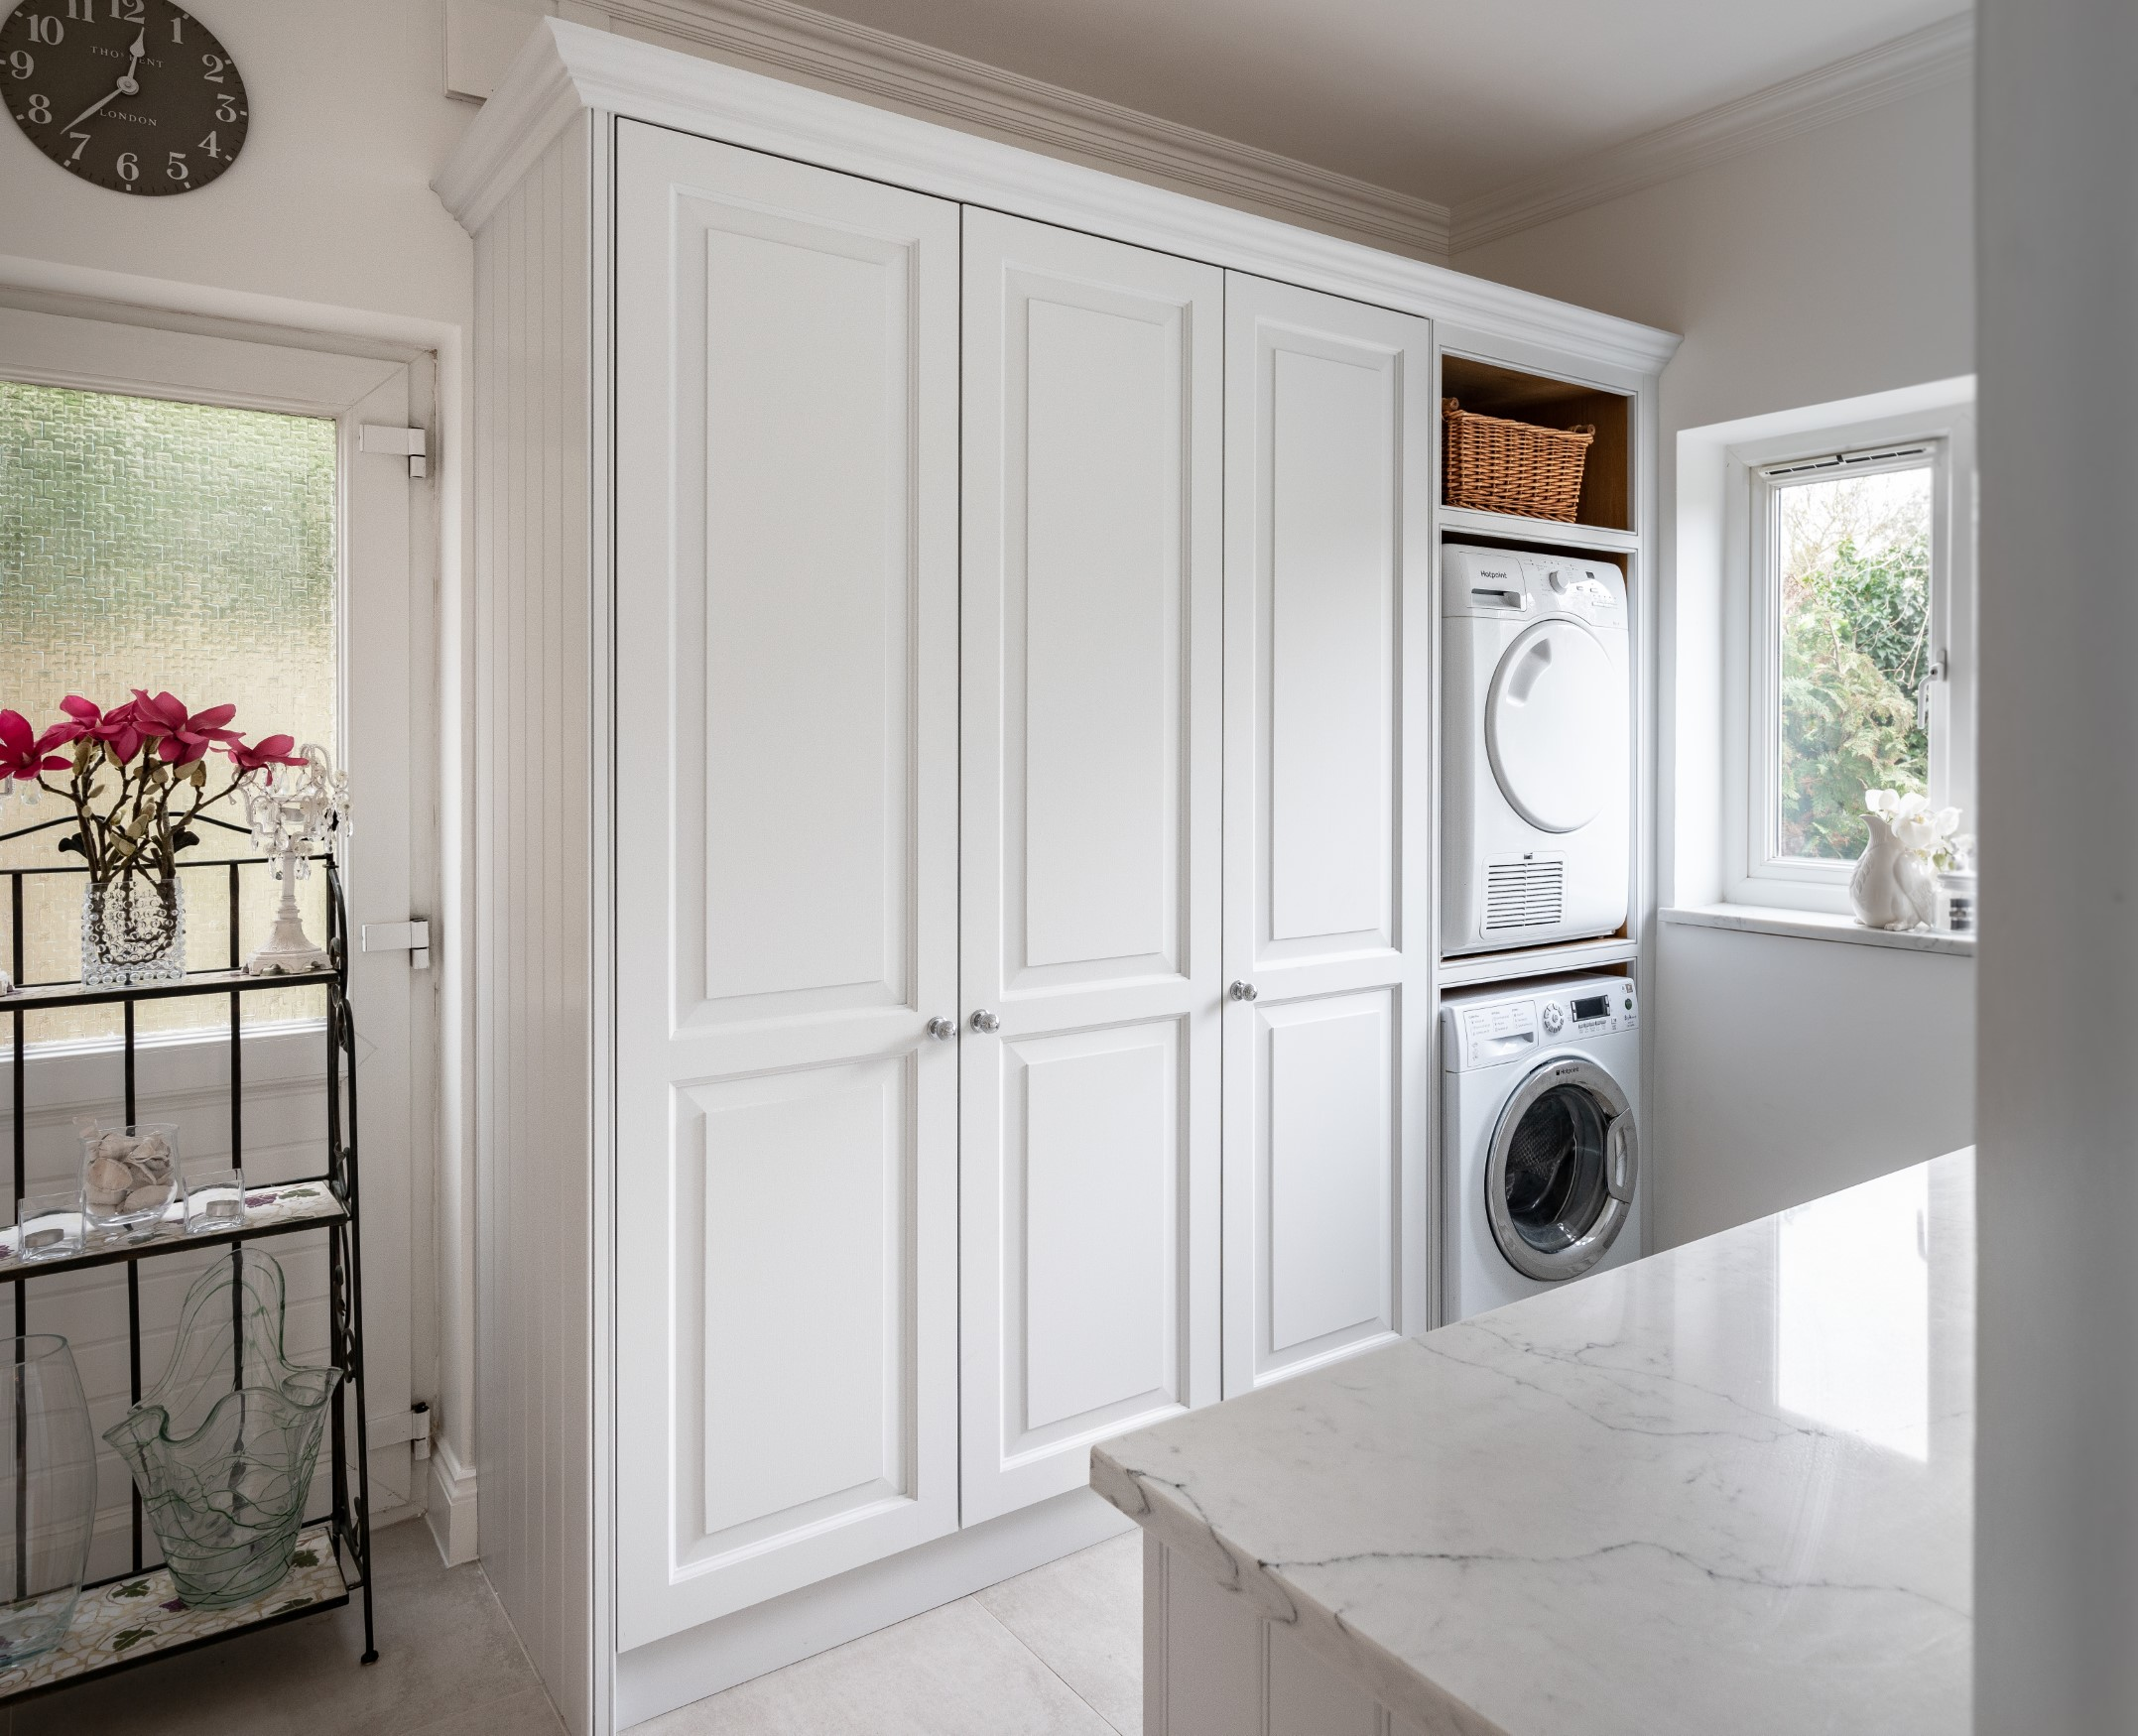 Floor To Ceiling Kitchen Cabinetry Nicholas Bridger